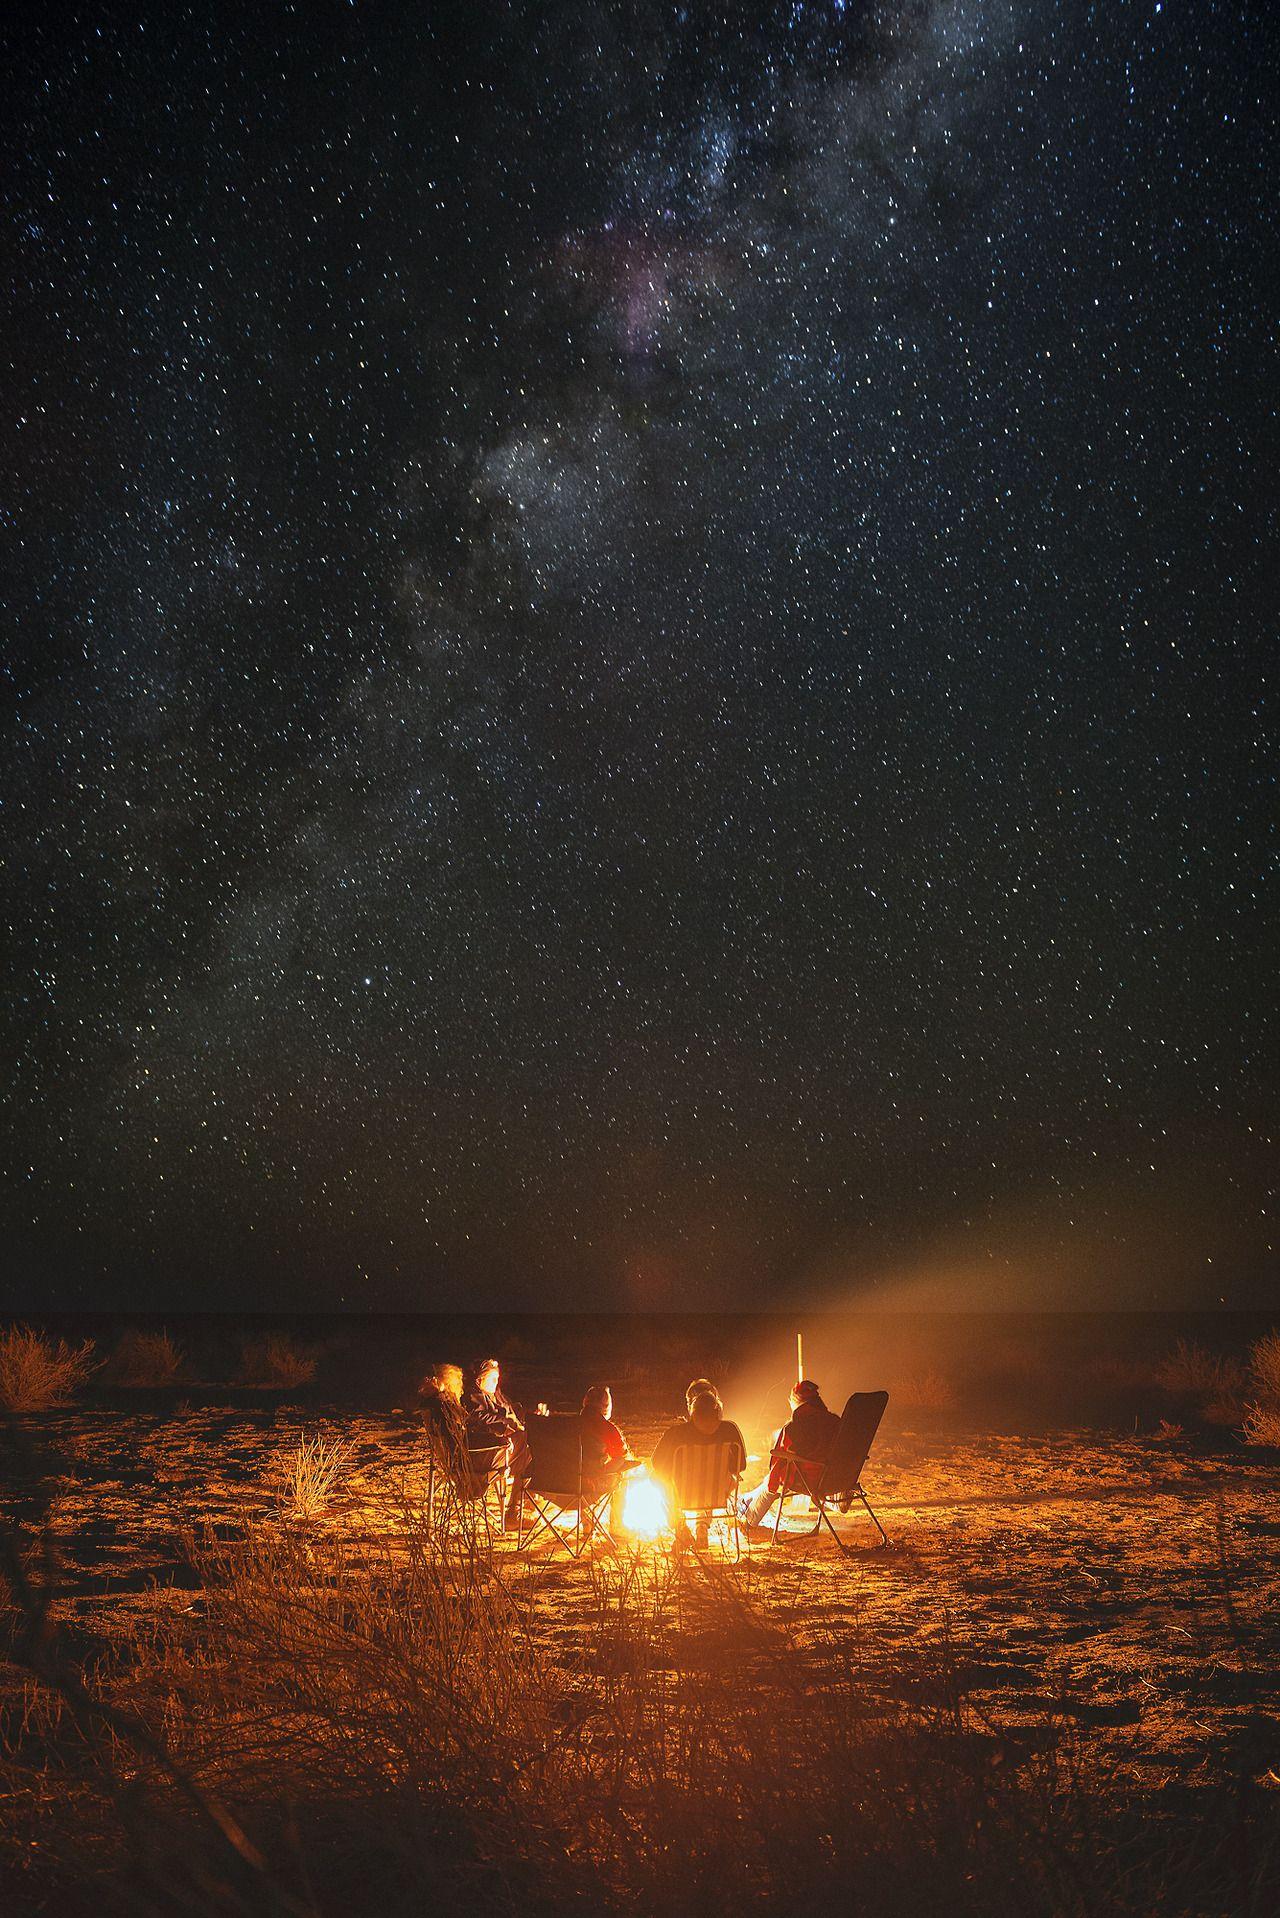 Pin by Fresh Exchange - Seasonal Eati on ADVENTURE | Adventure, Under the  stars, Photo